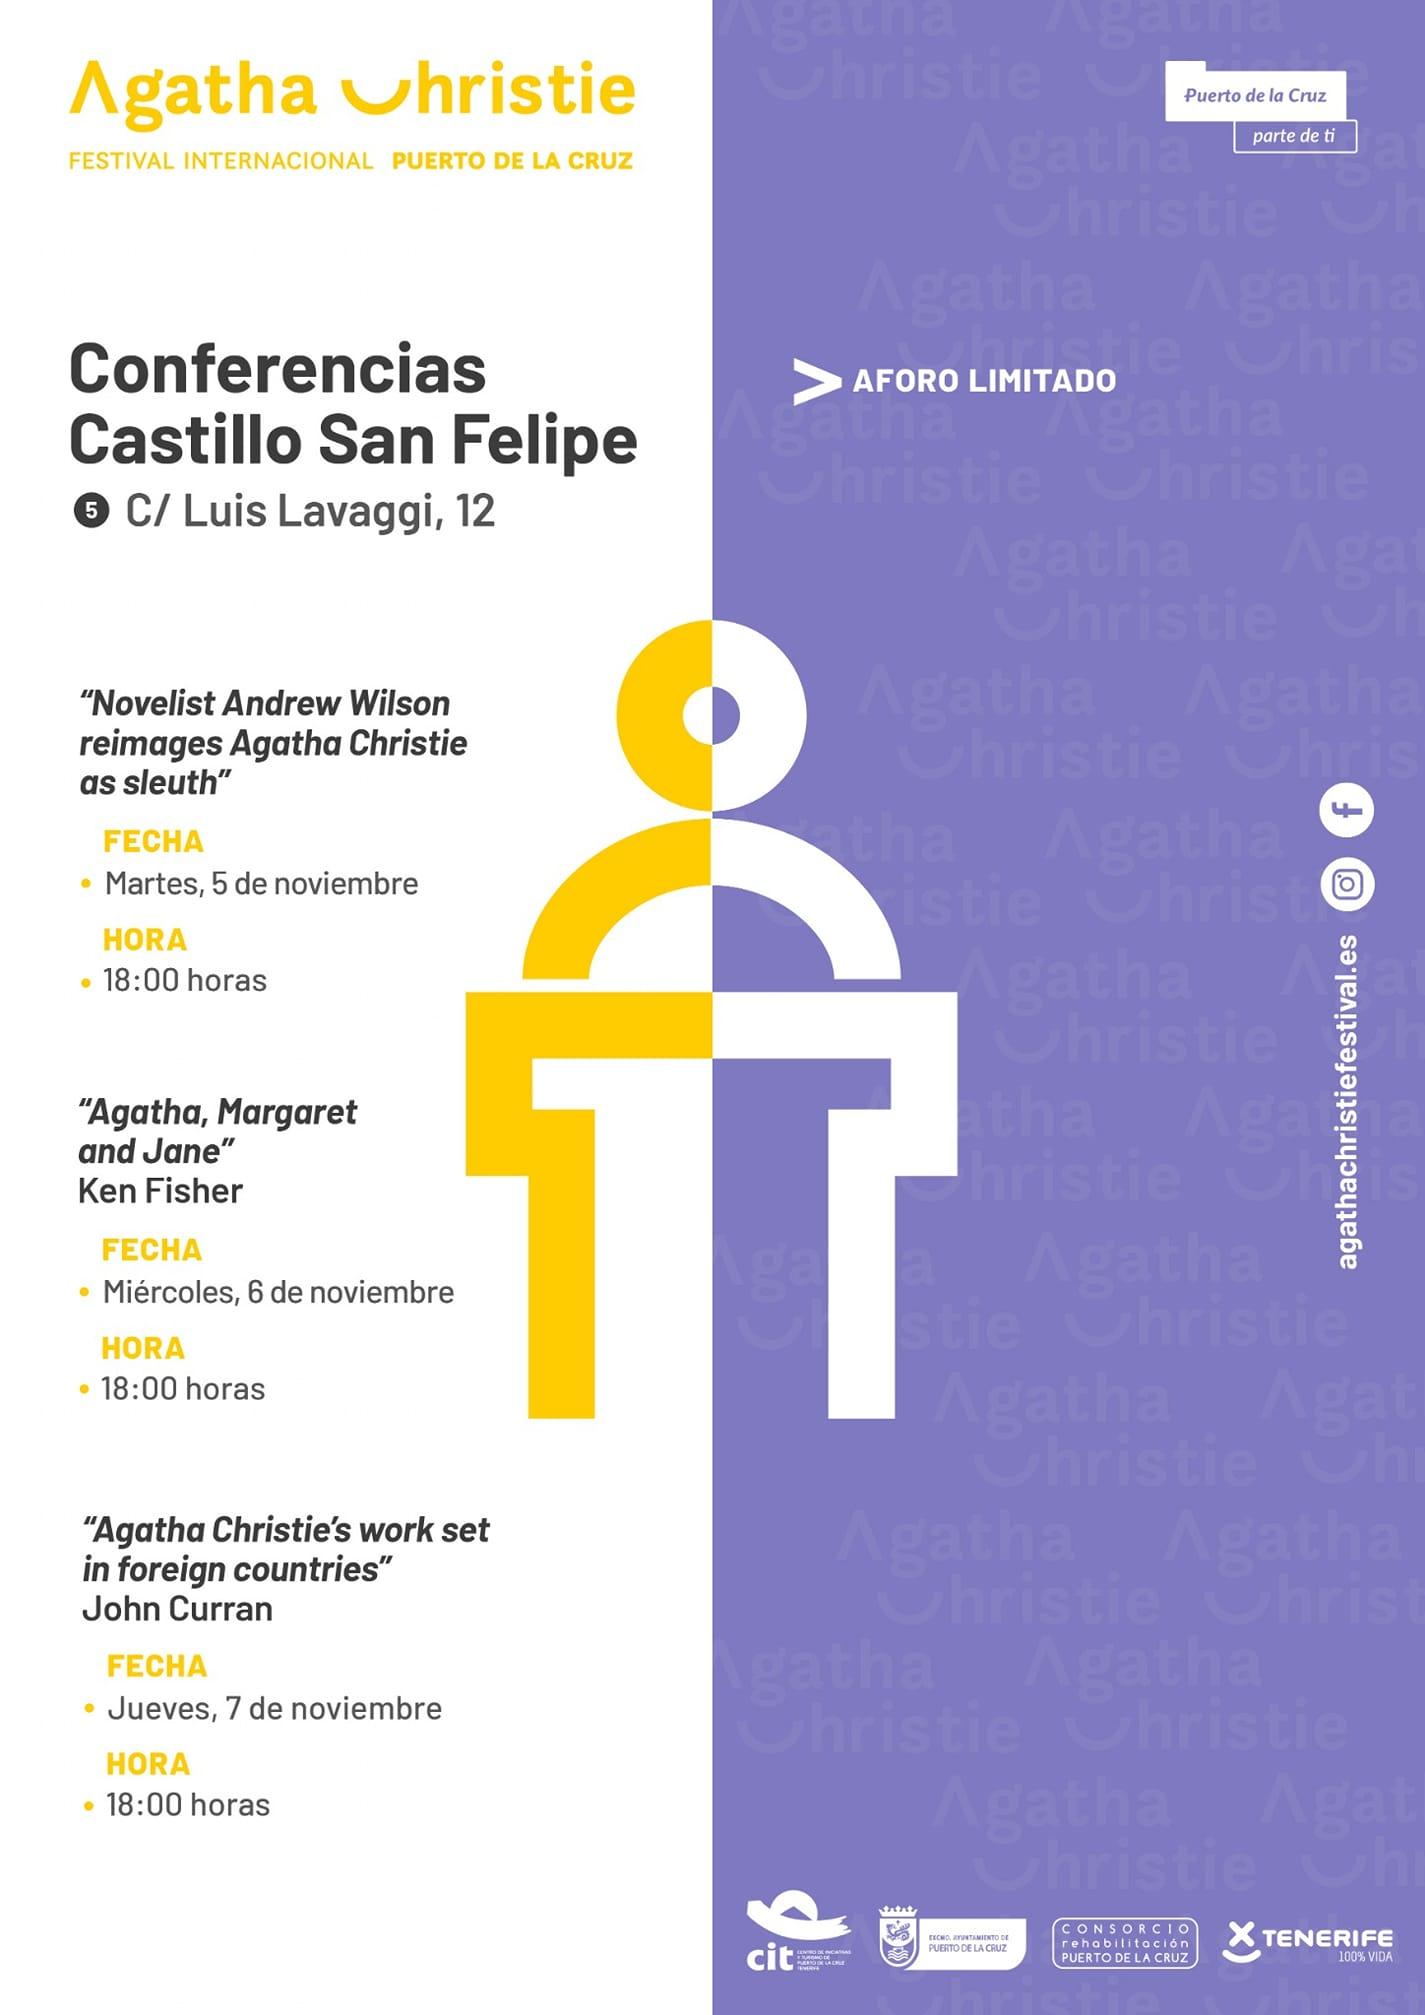 Conferences Castillo San Felipe